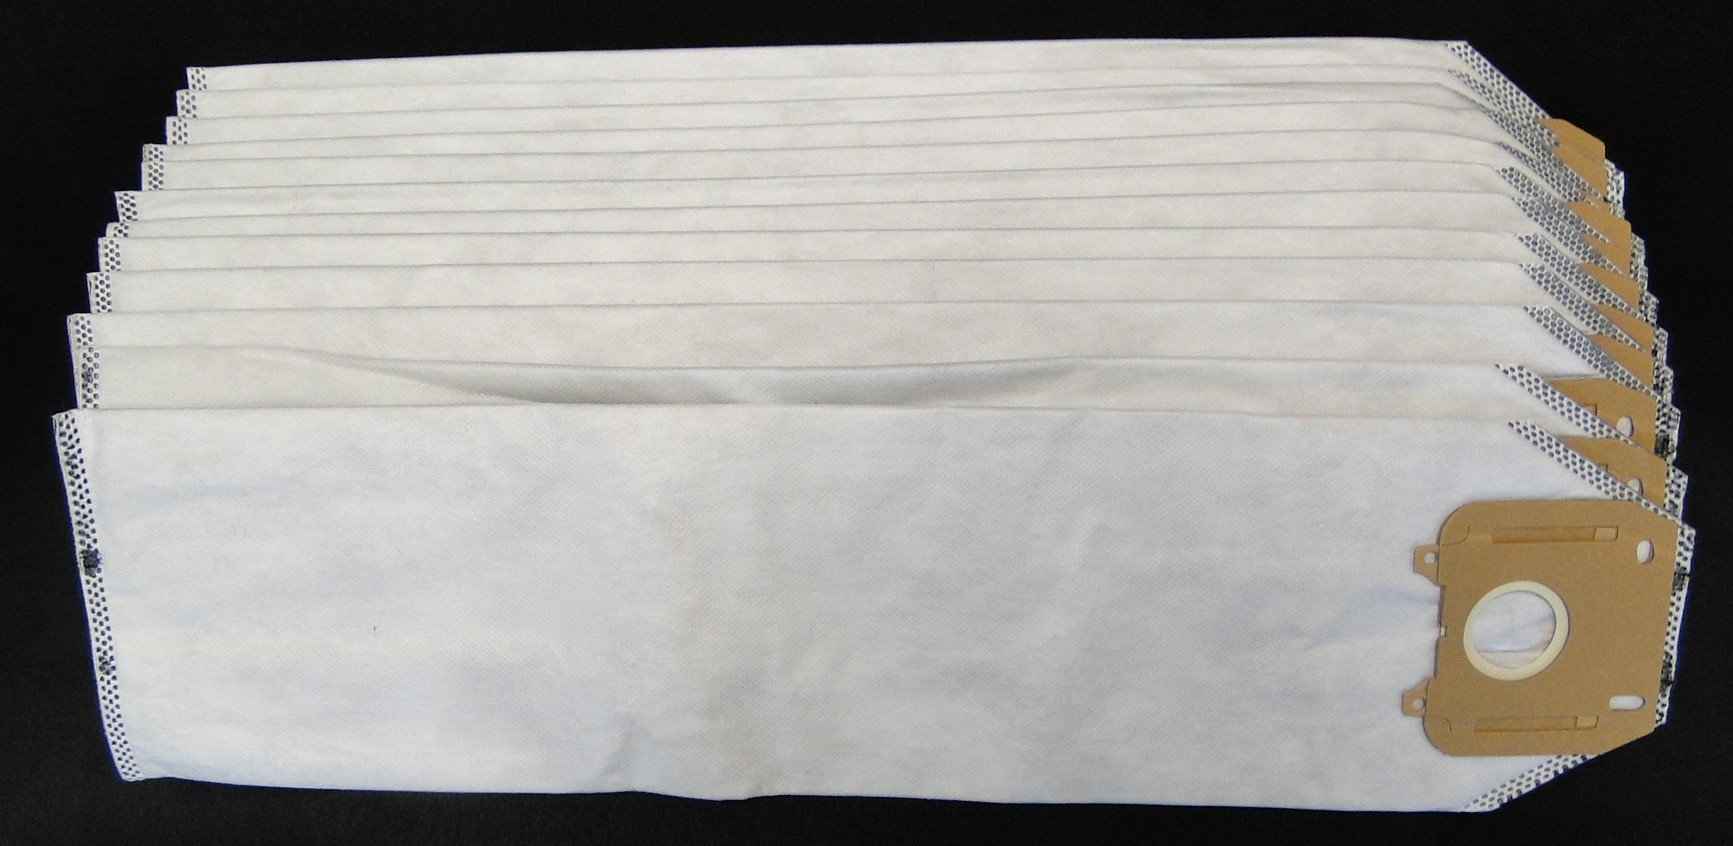 Generic Cloth HEPA Vacuum Bag for Oreck Magnesium Upright Vacuum Cleaners (Pack of 20)